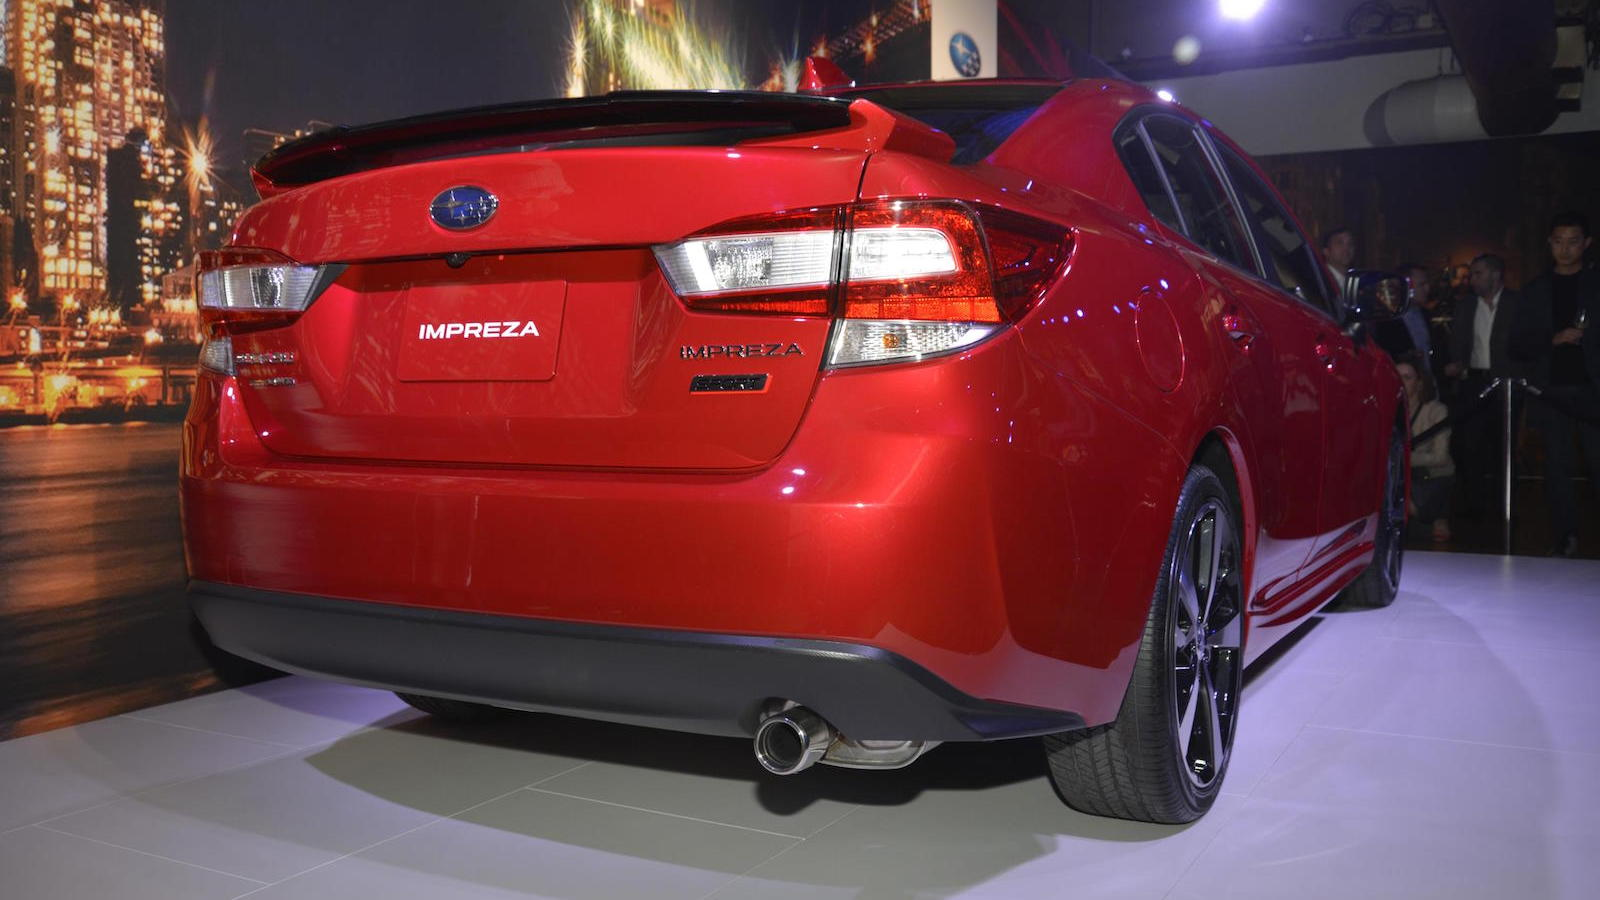 2017 Subaru Impreza, 2016 New York Auto Show